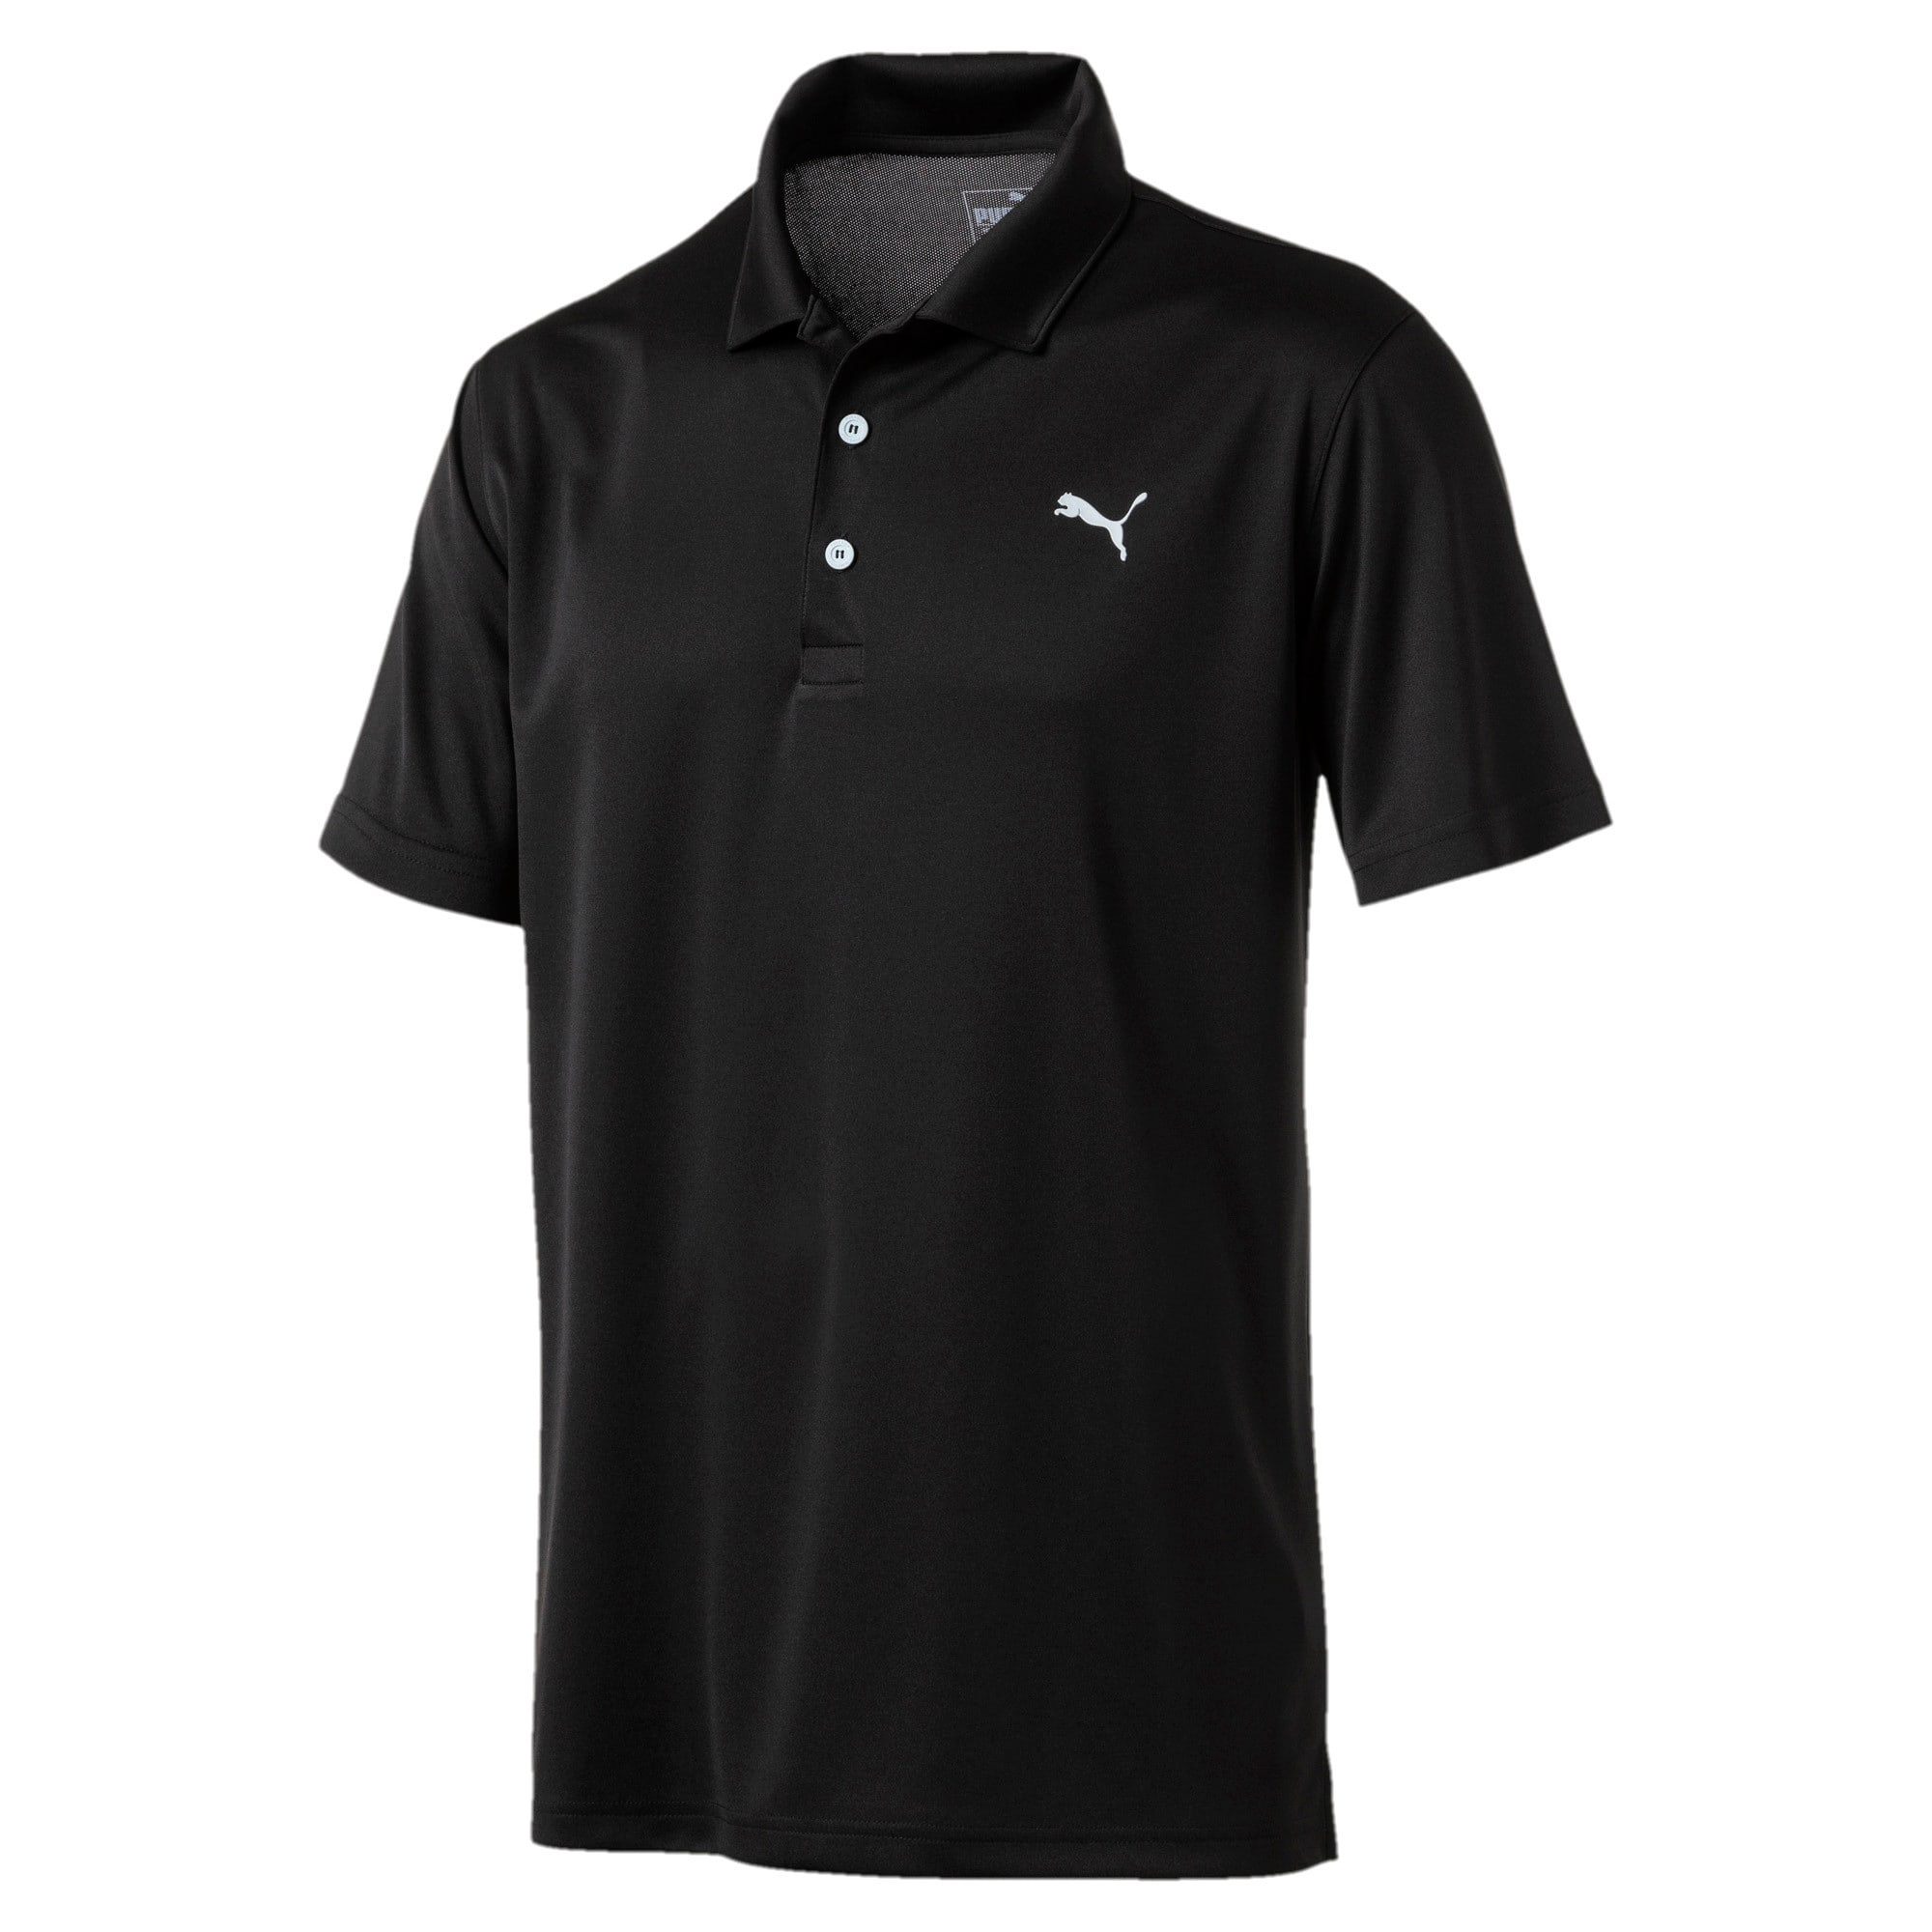 Thumbnail 4 of Rotation Herren Golf Polo, Puma Black, medium